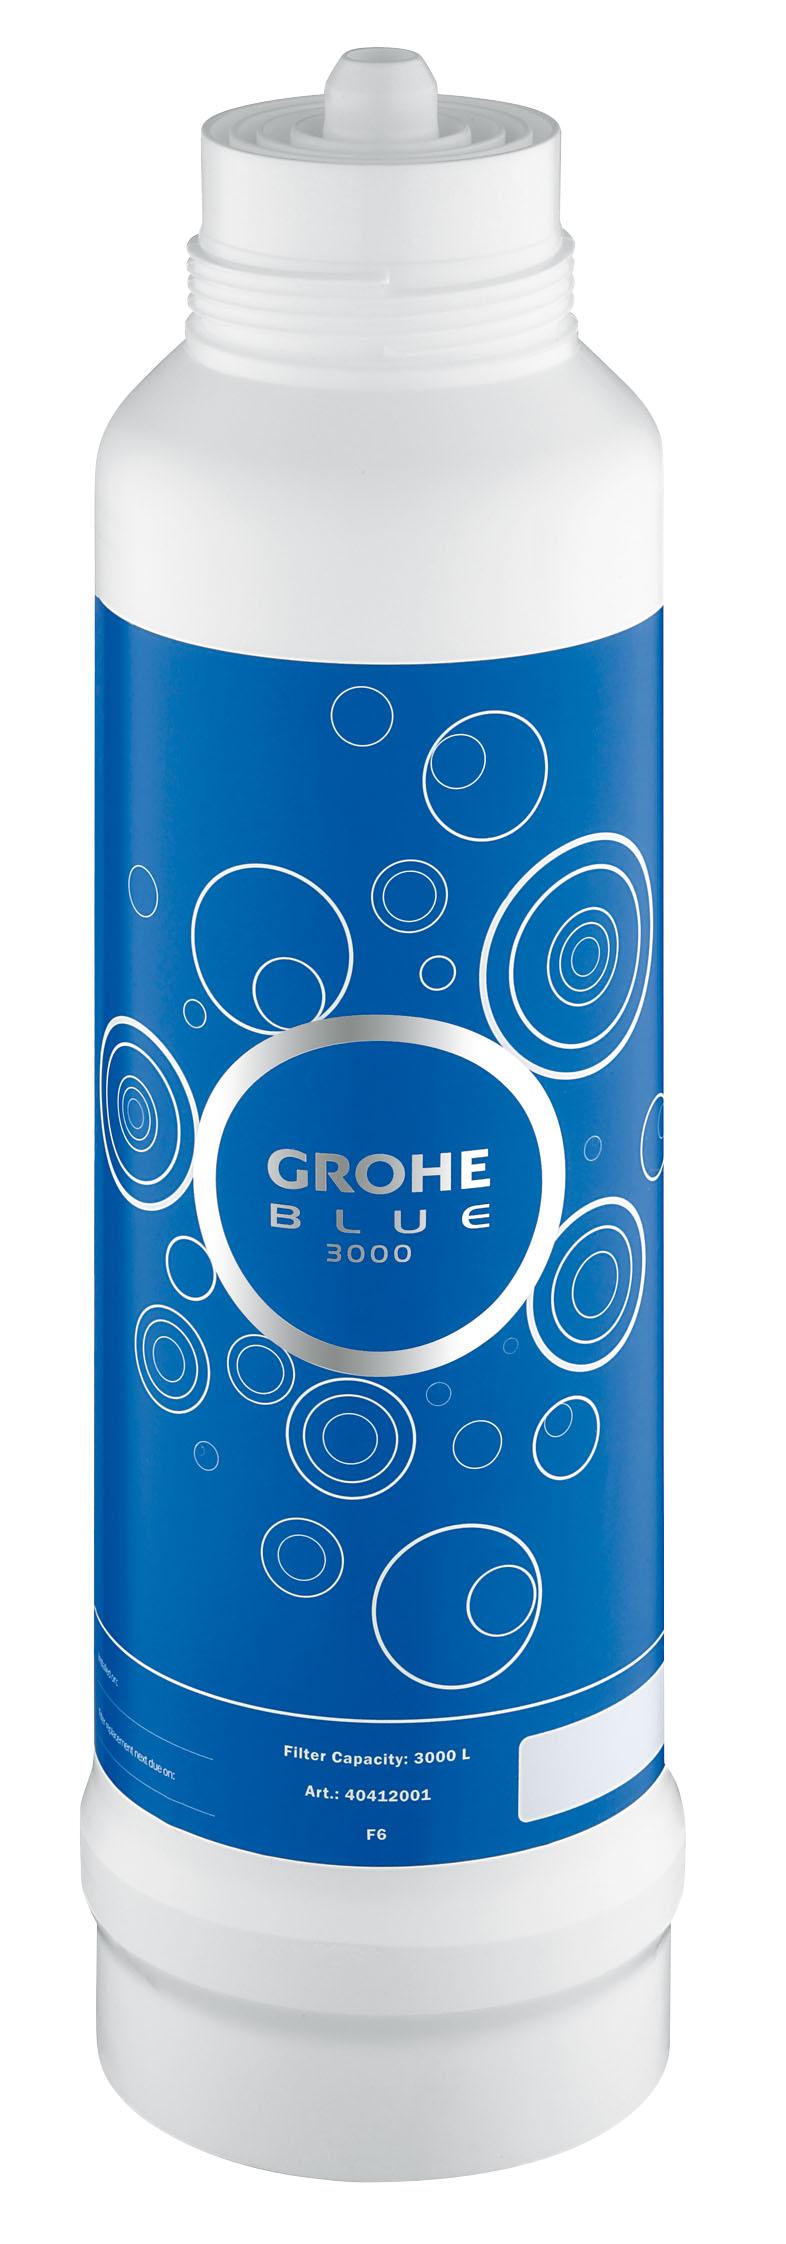 ������ ������� ��� ������ ������ Grohe Blue, 3000 � - Grohe40412001GROHE Blue. C���������� ���� �������� ����. ���� � ��� �� ������ ����� ������ ������ �� �������, �� � ������ ������������� ����� ������. ������� ��������� �������� GROHE � BWT � ����������� ������� ����� ��������������� � �������� �������� ������������, ������������� � ���������� ��������� ��������. ��������� ���� ��������� � ����, �� ������� ������������� ����� ������� ������ ����. ������������� ���������� ����� GROHE Blue ���������� ������������� ���� � ��������� ��������.��� ���� �� ������ � ������������ ������������ ���������. ������� GROHE Blue �������� ���������� ������� � ������������� ���� � ���������� �� � �������� �� ���� � ��������� ��� �����. ���������� ���������� 5-����������� ���������� ������� ���� �� ���� ��������, ���������� �� ���� � �����. � ���������� ���������� ��������� ���� � ��� ������� ��������, ��������, ������� � �����. ��� �������� ������ GROHE Blue: 1) ��������������� ���������� - ��������������� ������ ������� �� ������, ���������� � ���� ��� ��...